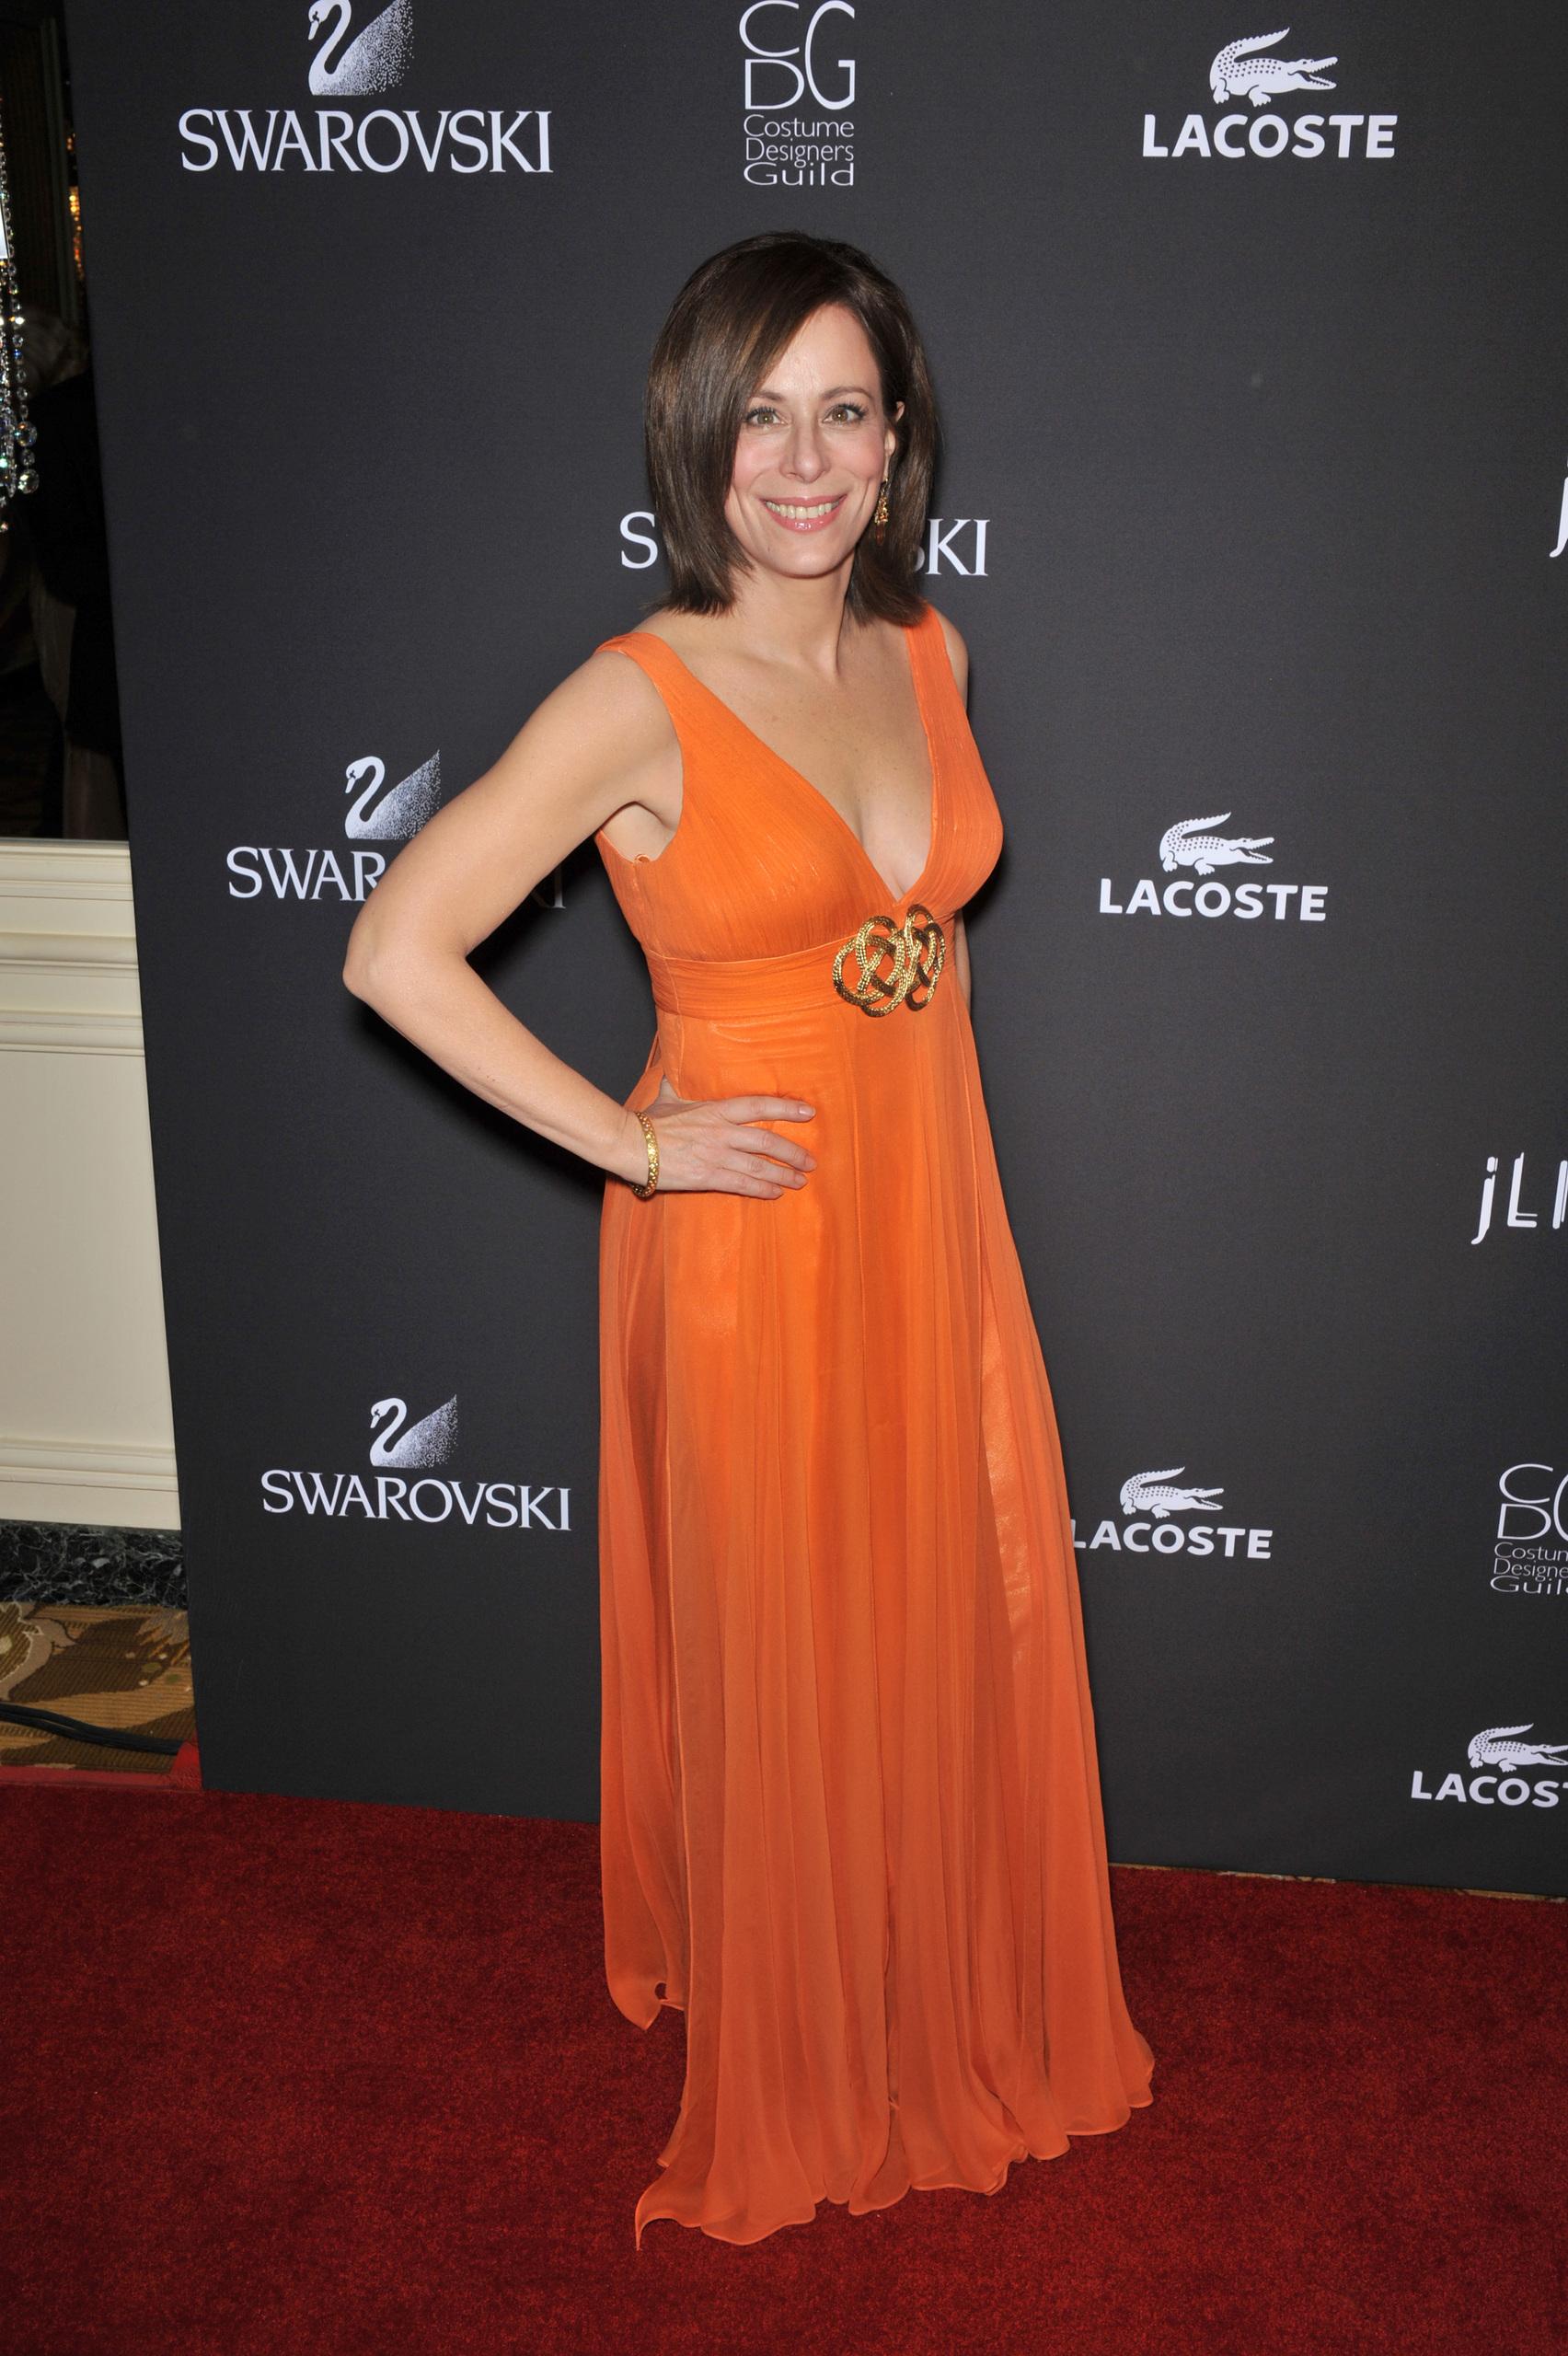 11th Annual Costume Designers Guild Awards - Jane